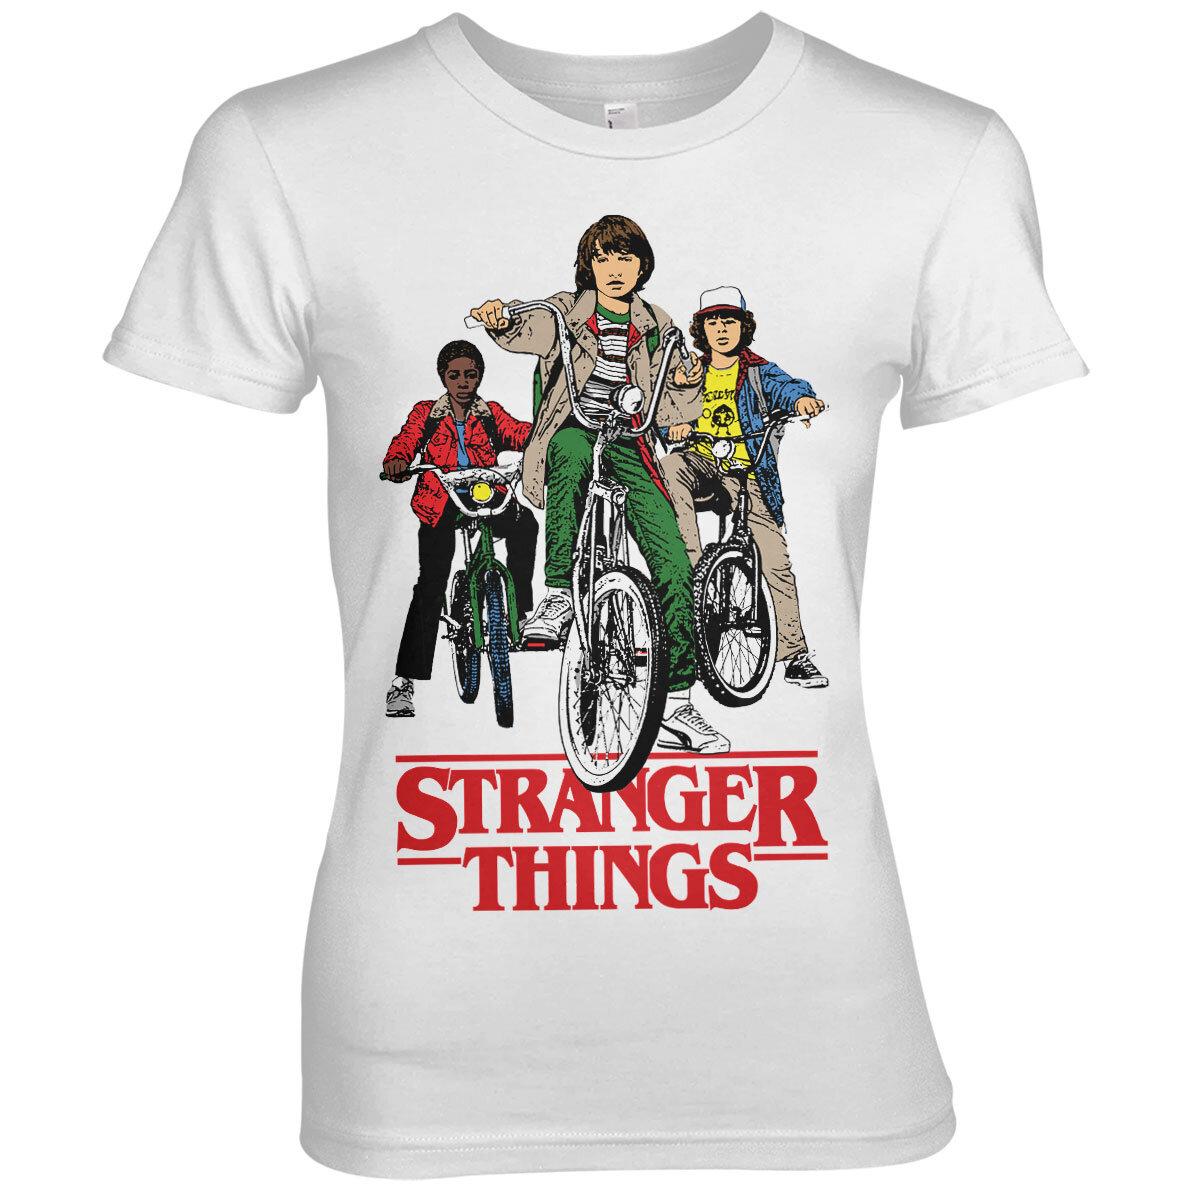 Stranger Things Bikes Girly Tee